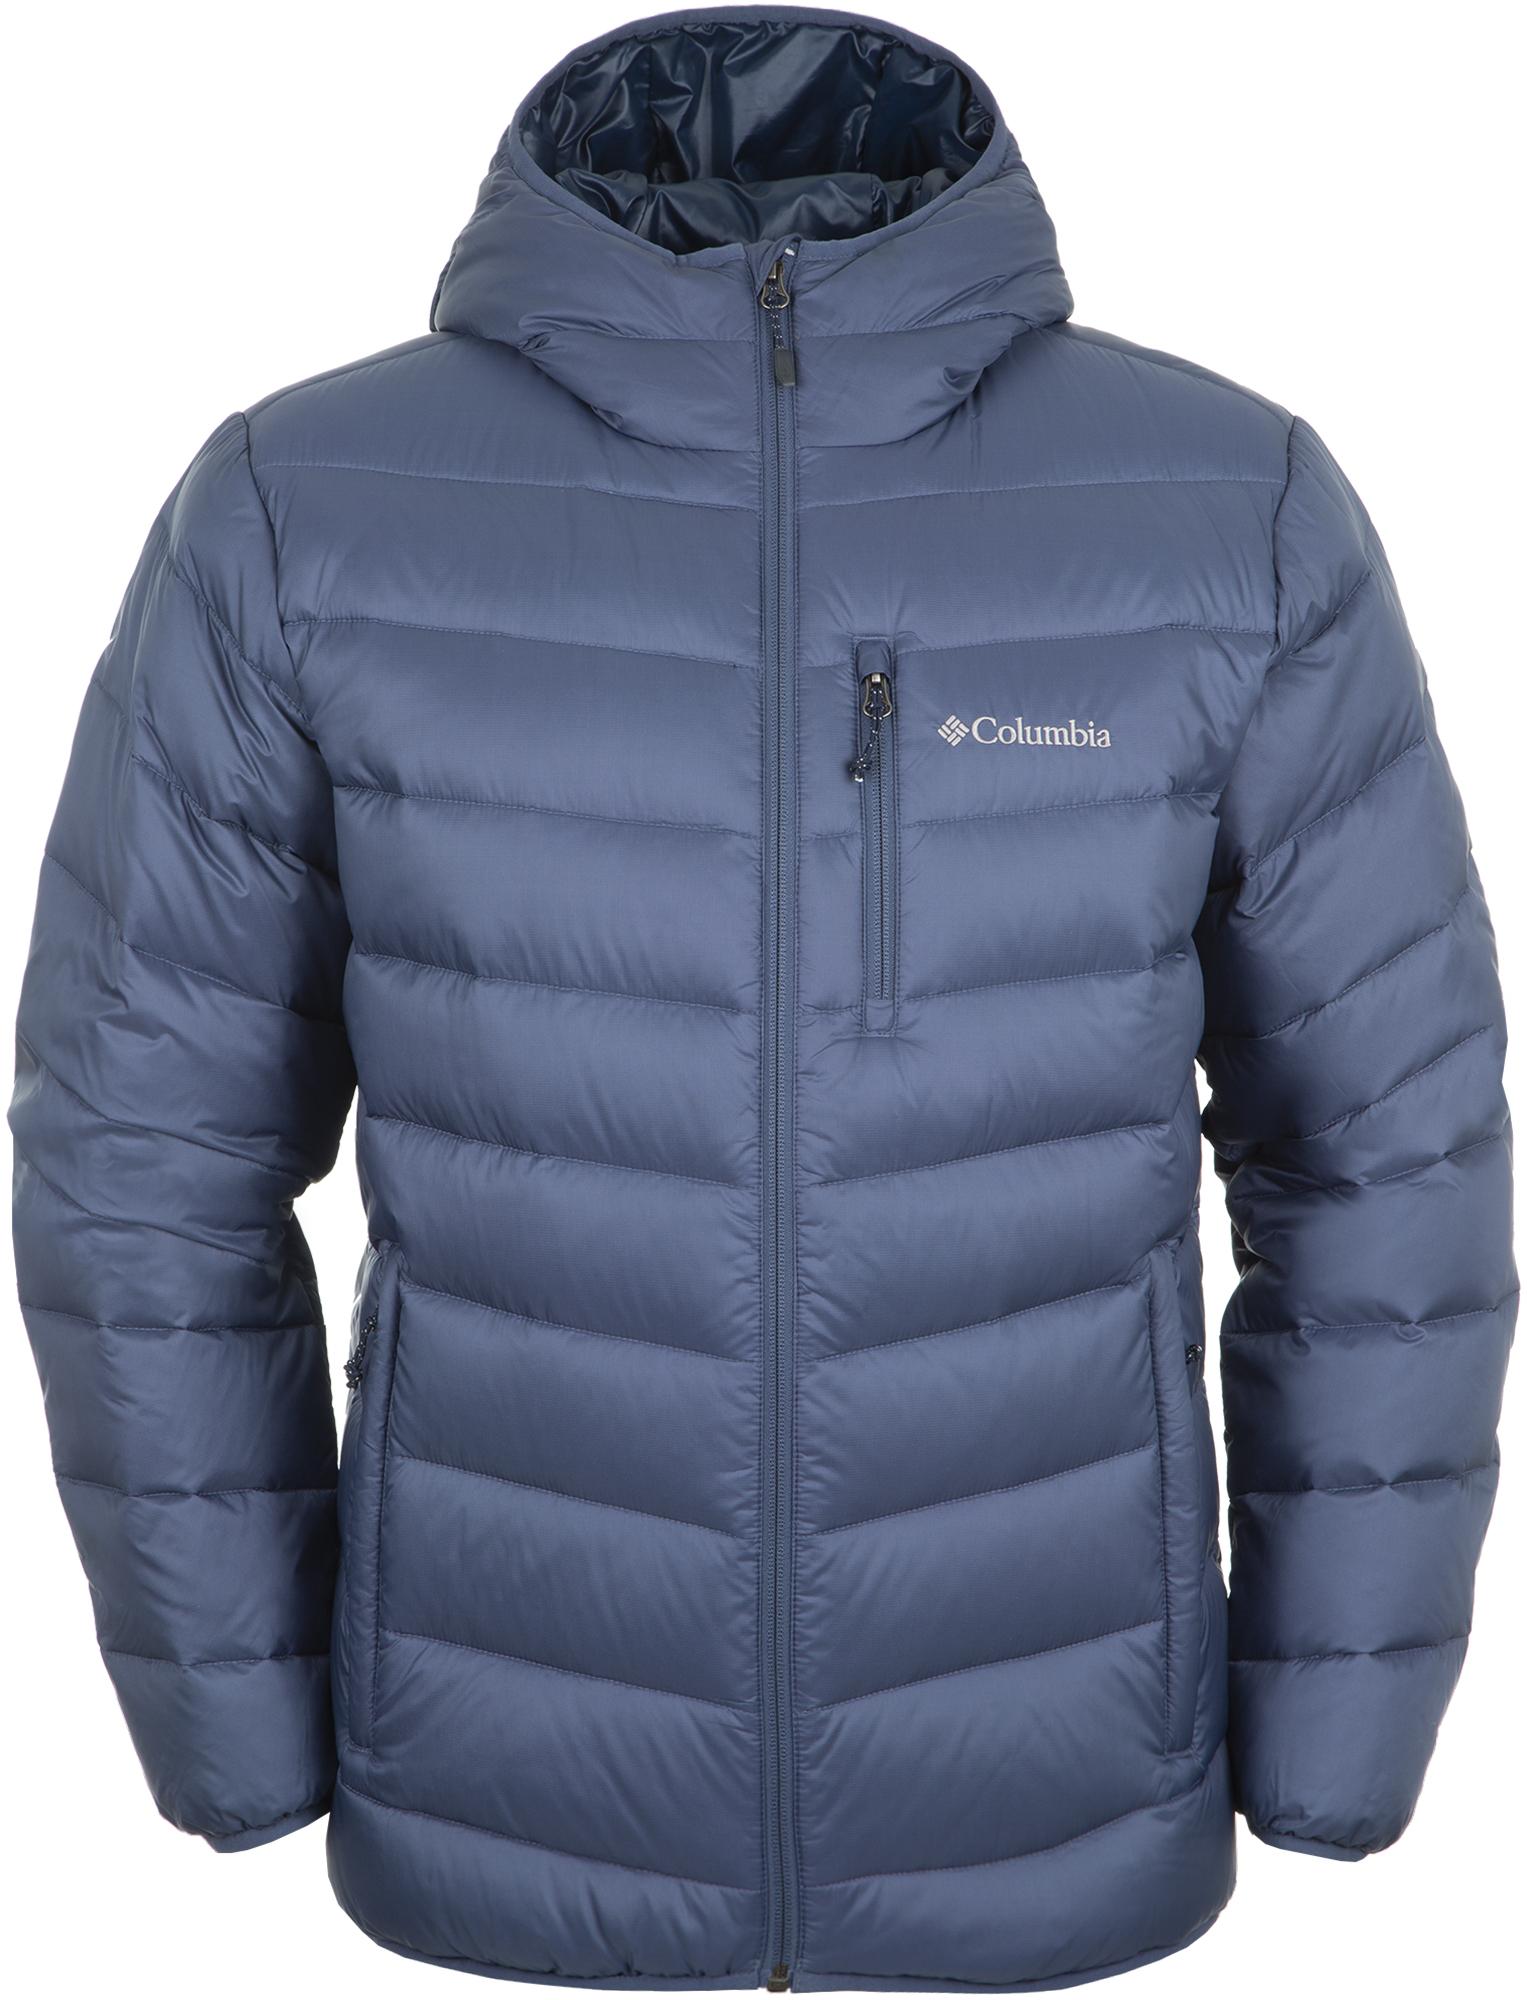 Columbia Куртка пуховая мужская Columbia Hellfire 650 TurboDown, размер 56-58 цена